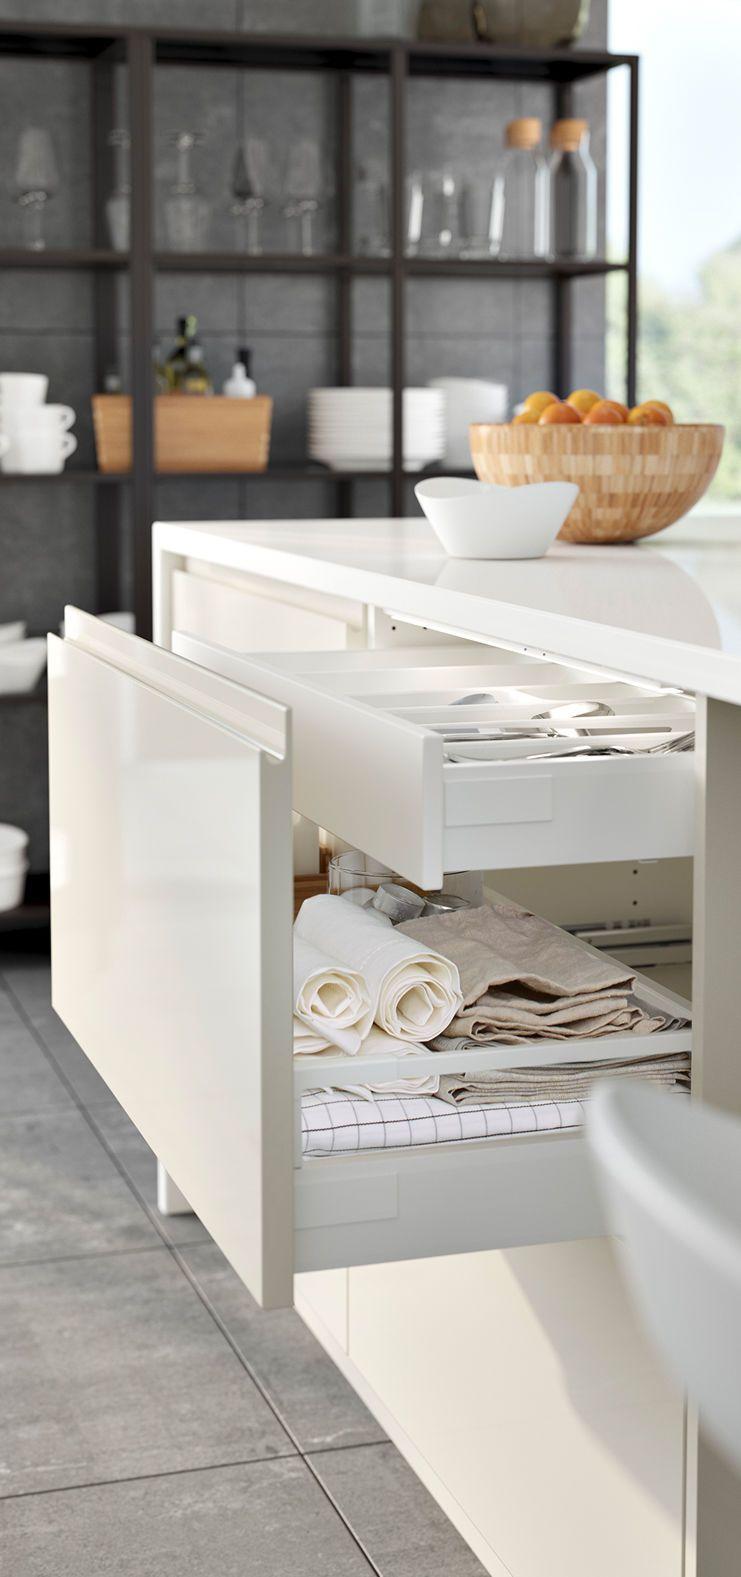 Ikea kitchen metod brochure smallhousediy awesome